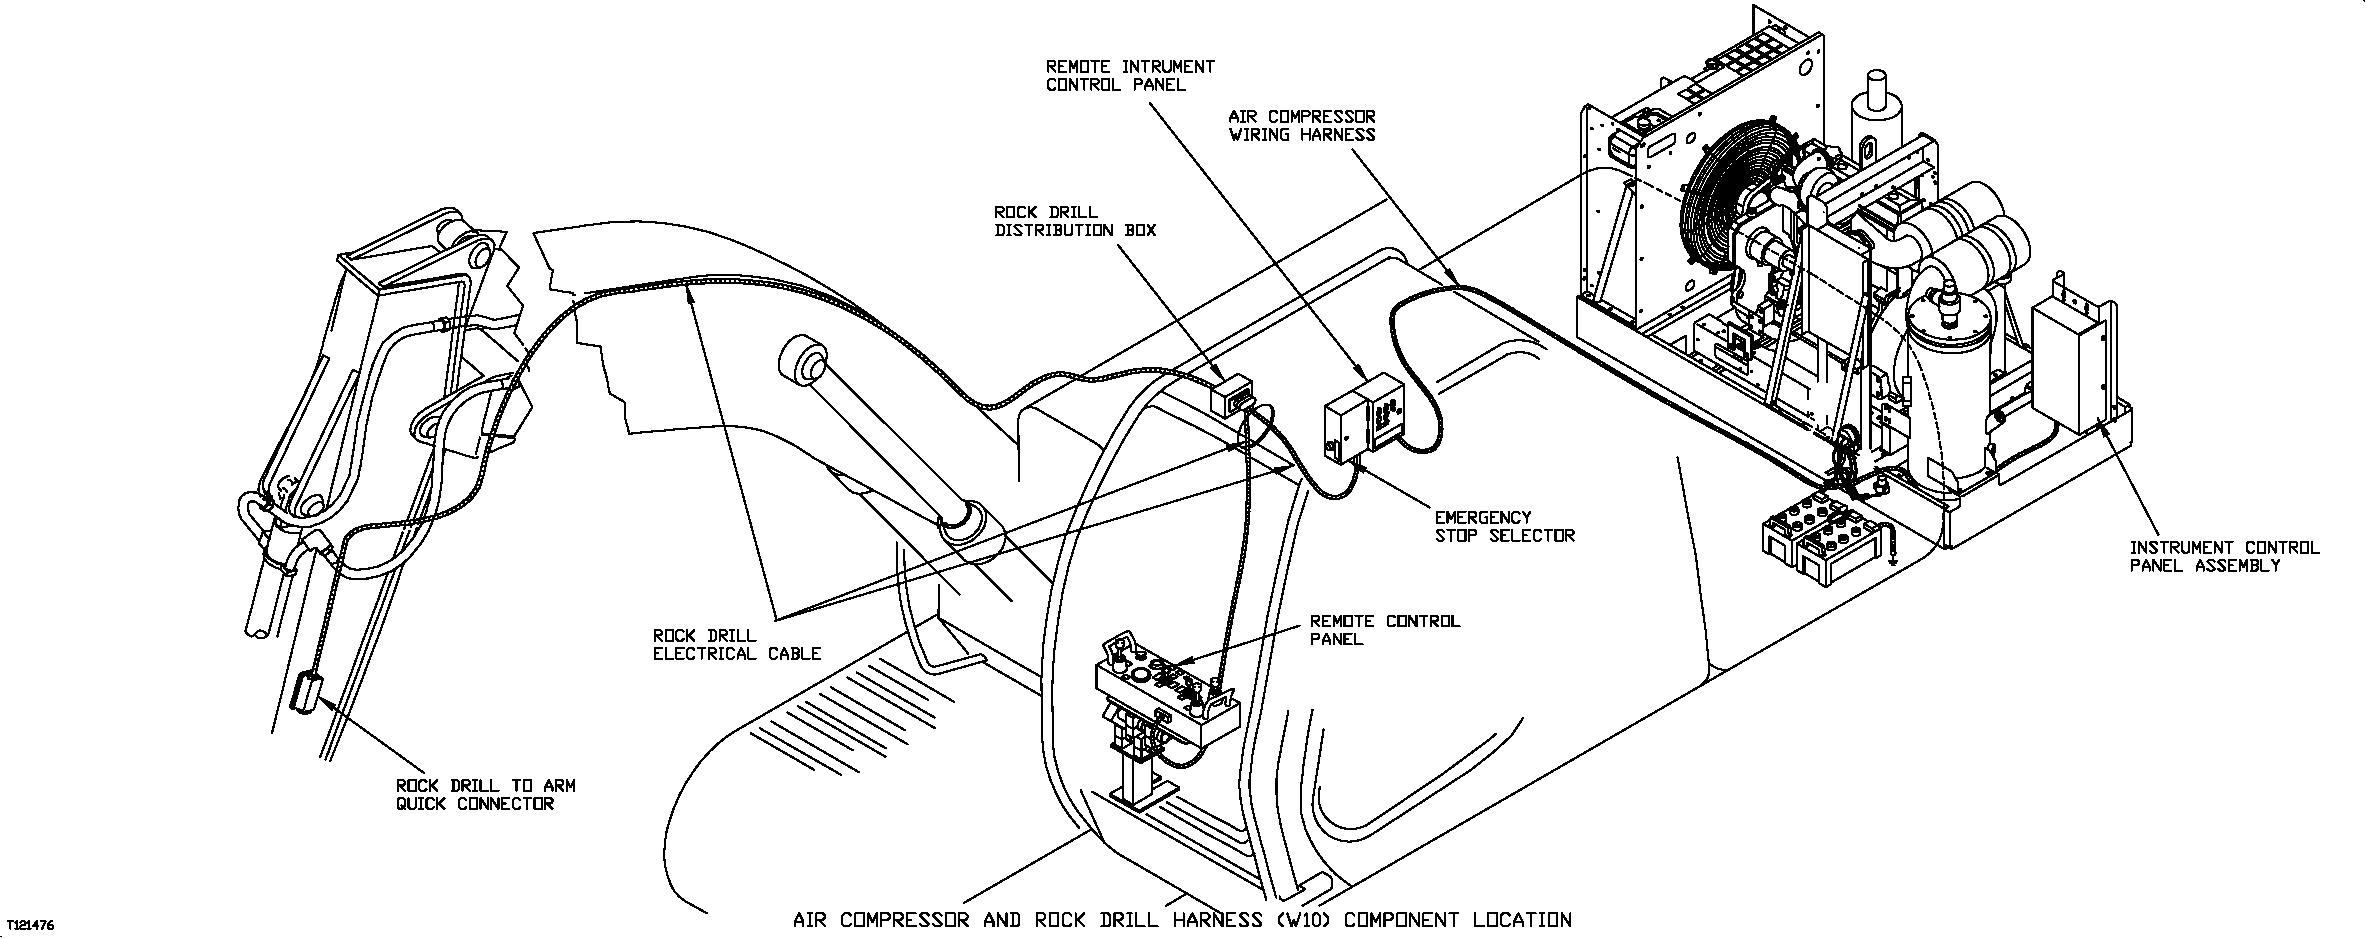 Air Compressor And Rock Drill Harness W10 Component Location